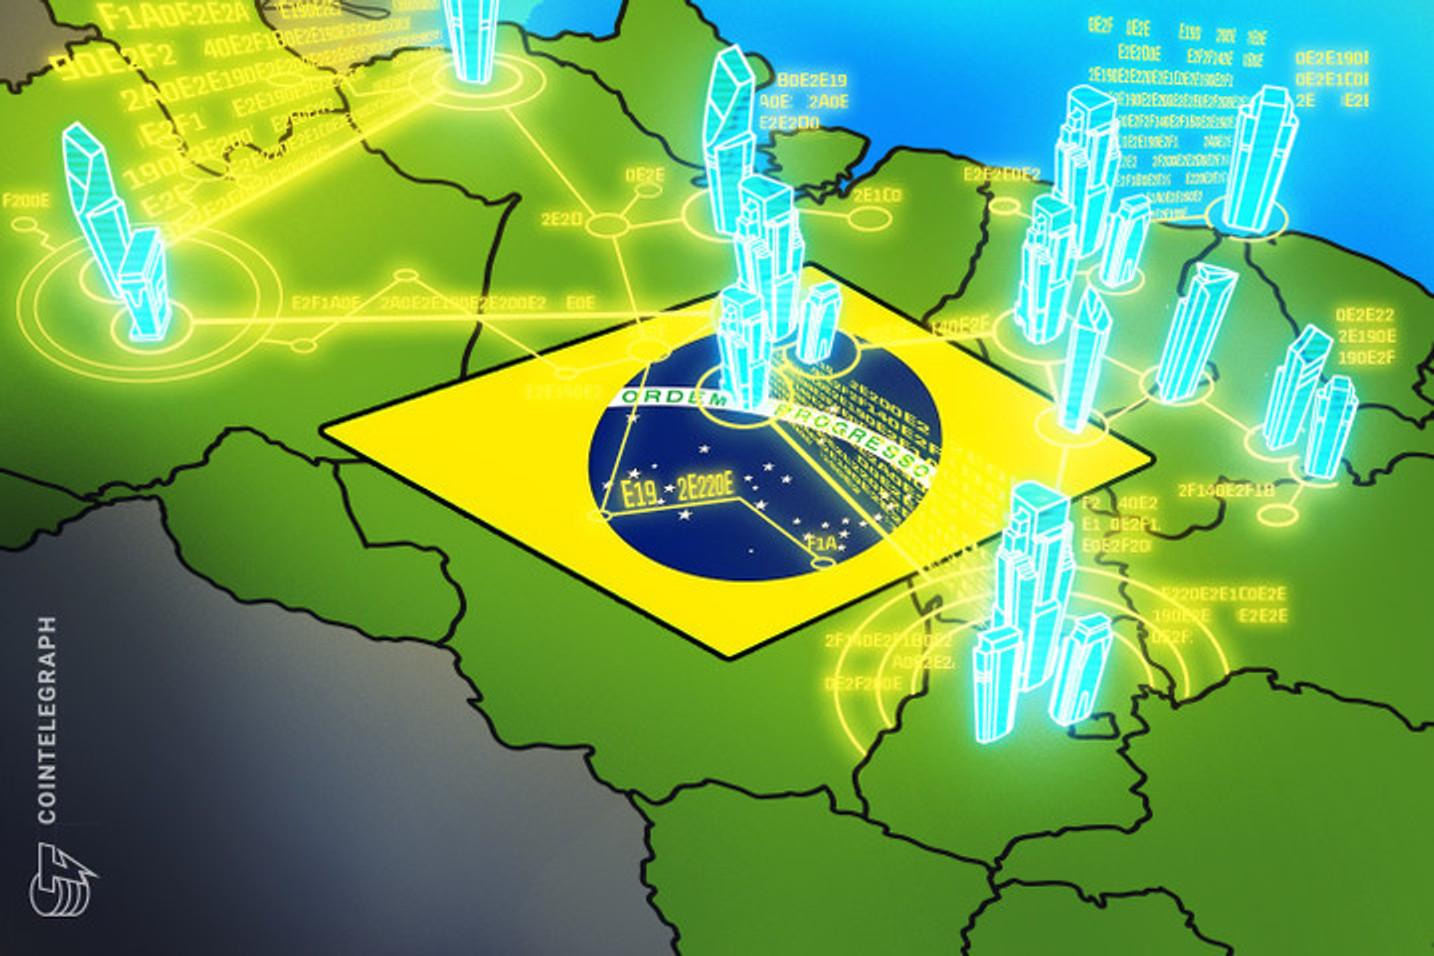 Via Varejo, controadora das Casas Bahia e do Ponto Frio, anuncia compra de fintech cripto norte-americana